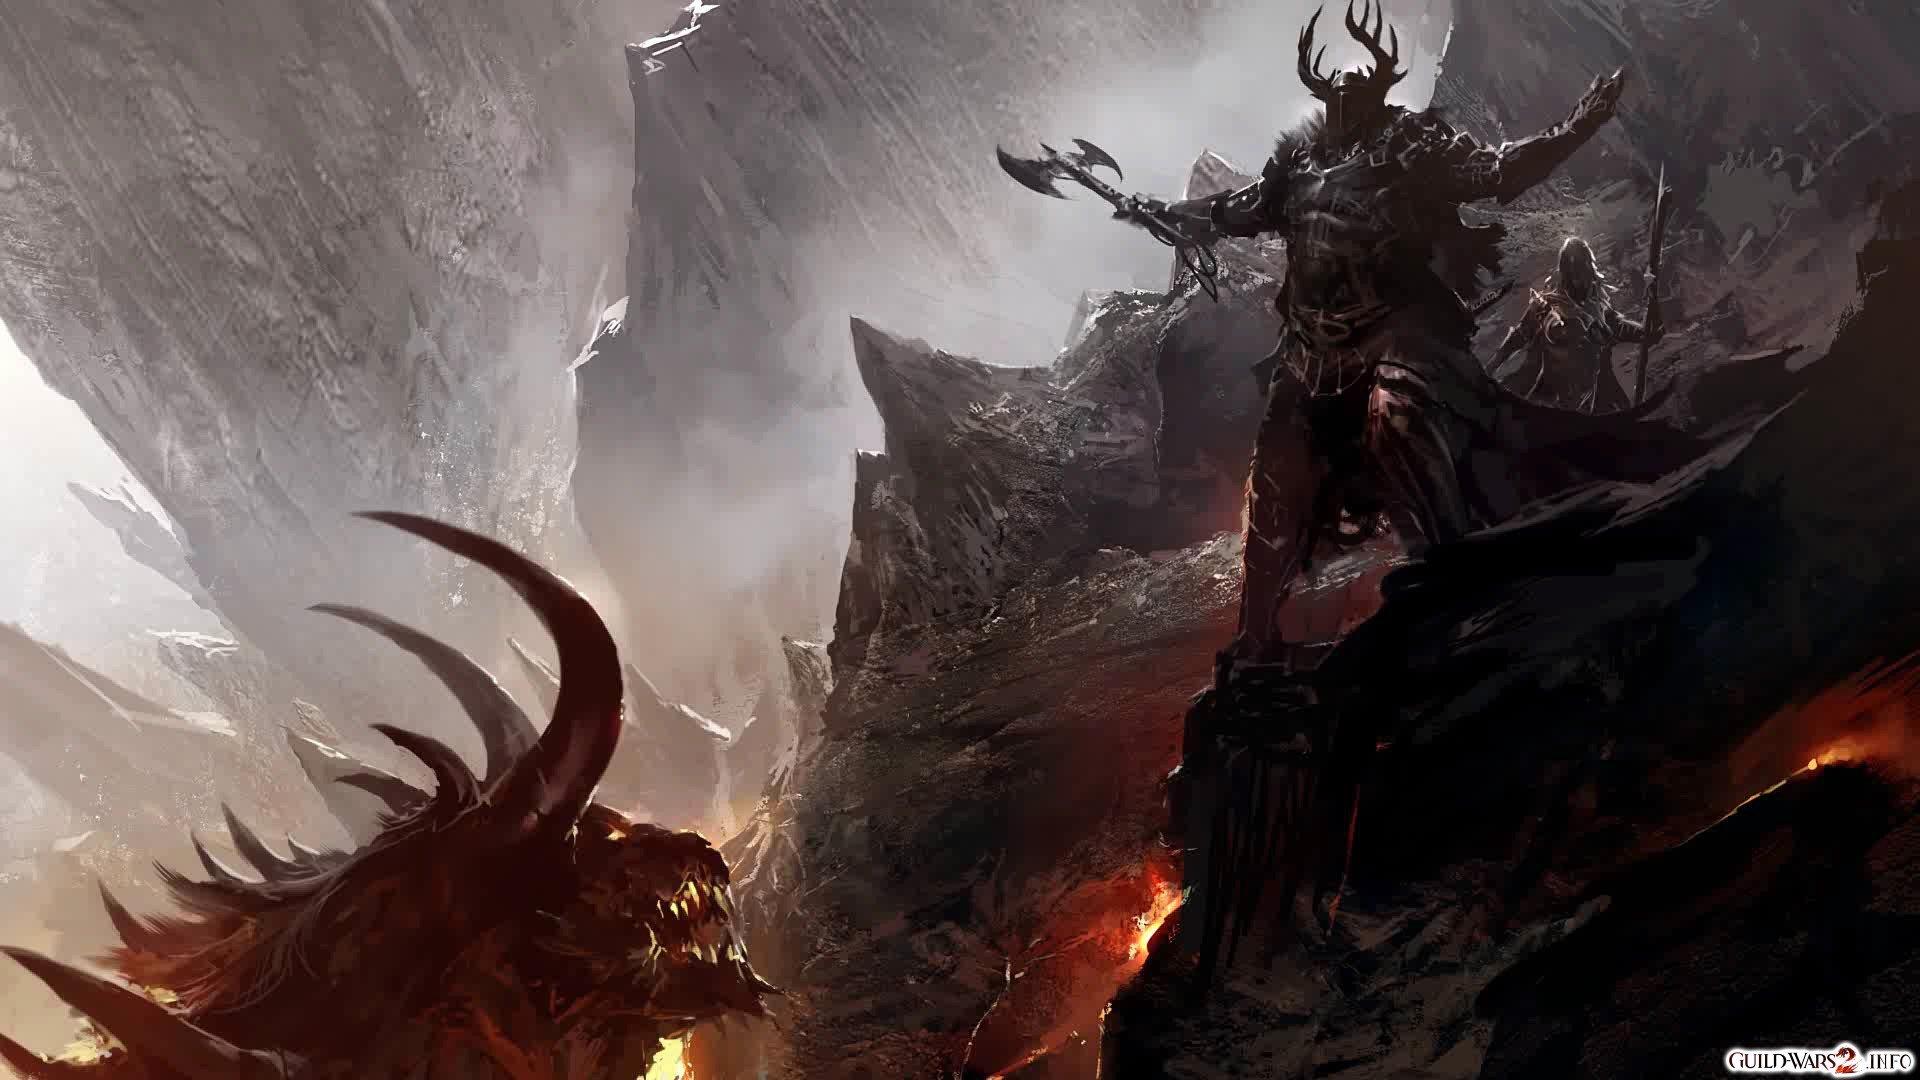 Guild Wars 2 Video Games Charr Wallpapers Hd Desktop: Dragons Devil Guild Wars Concept Art Warriors Come At Me